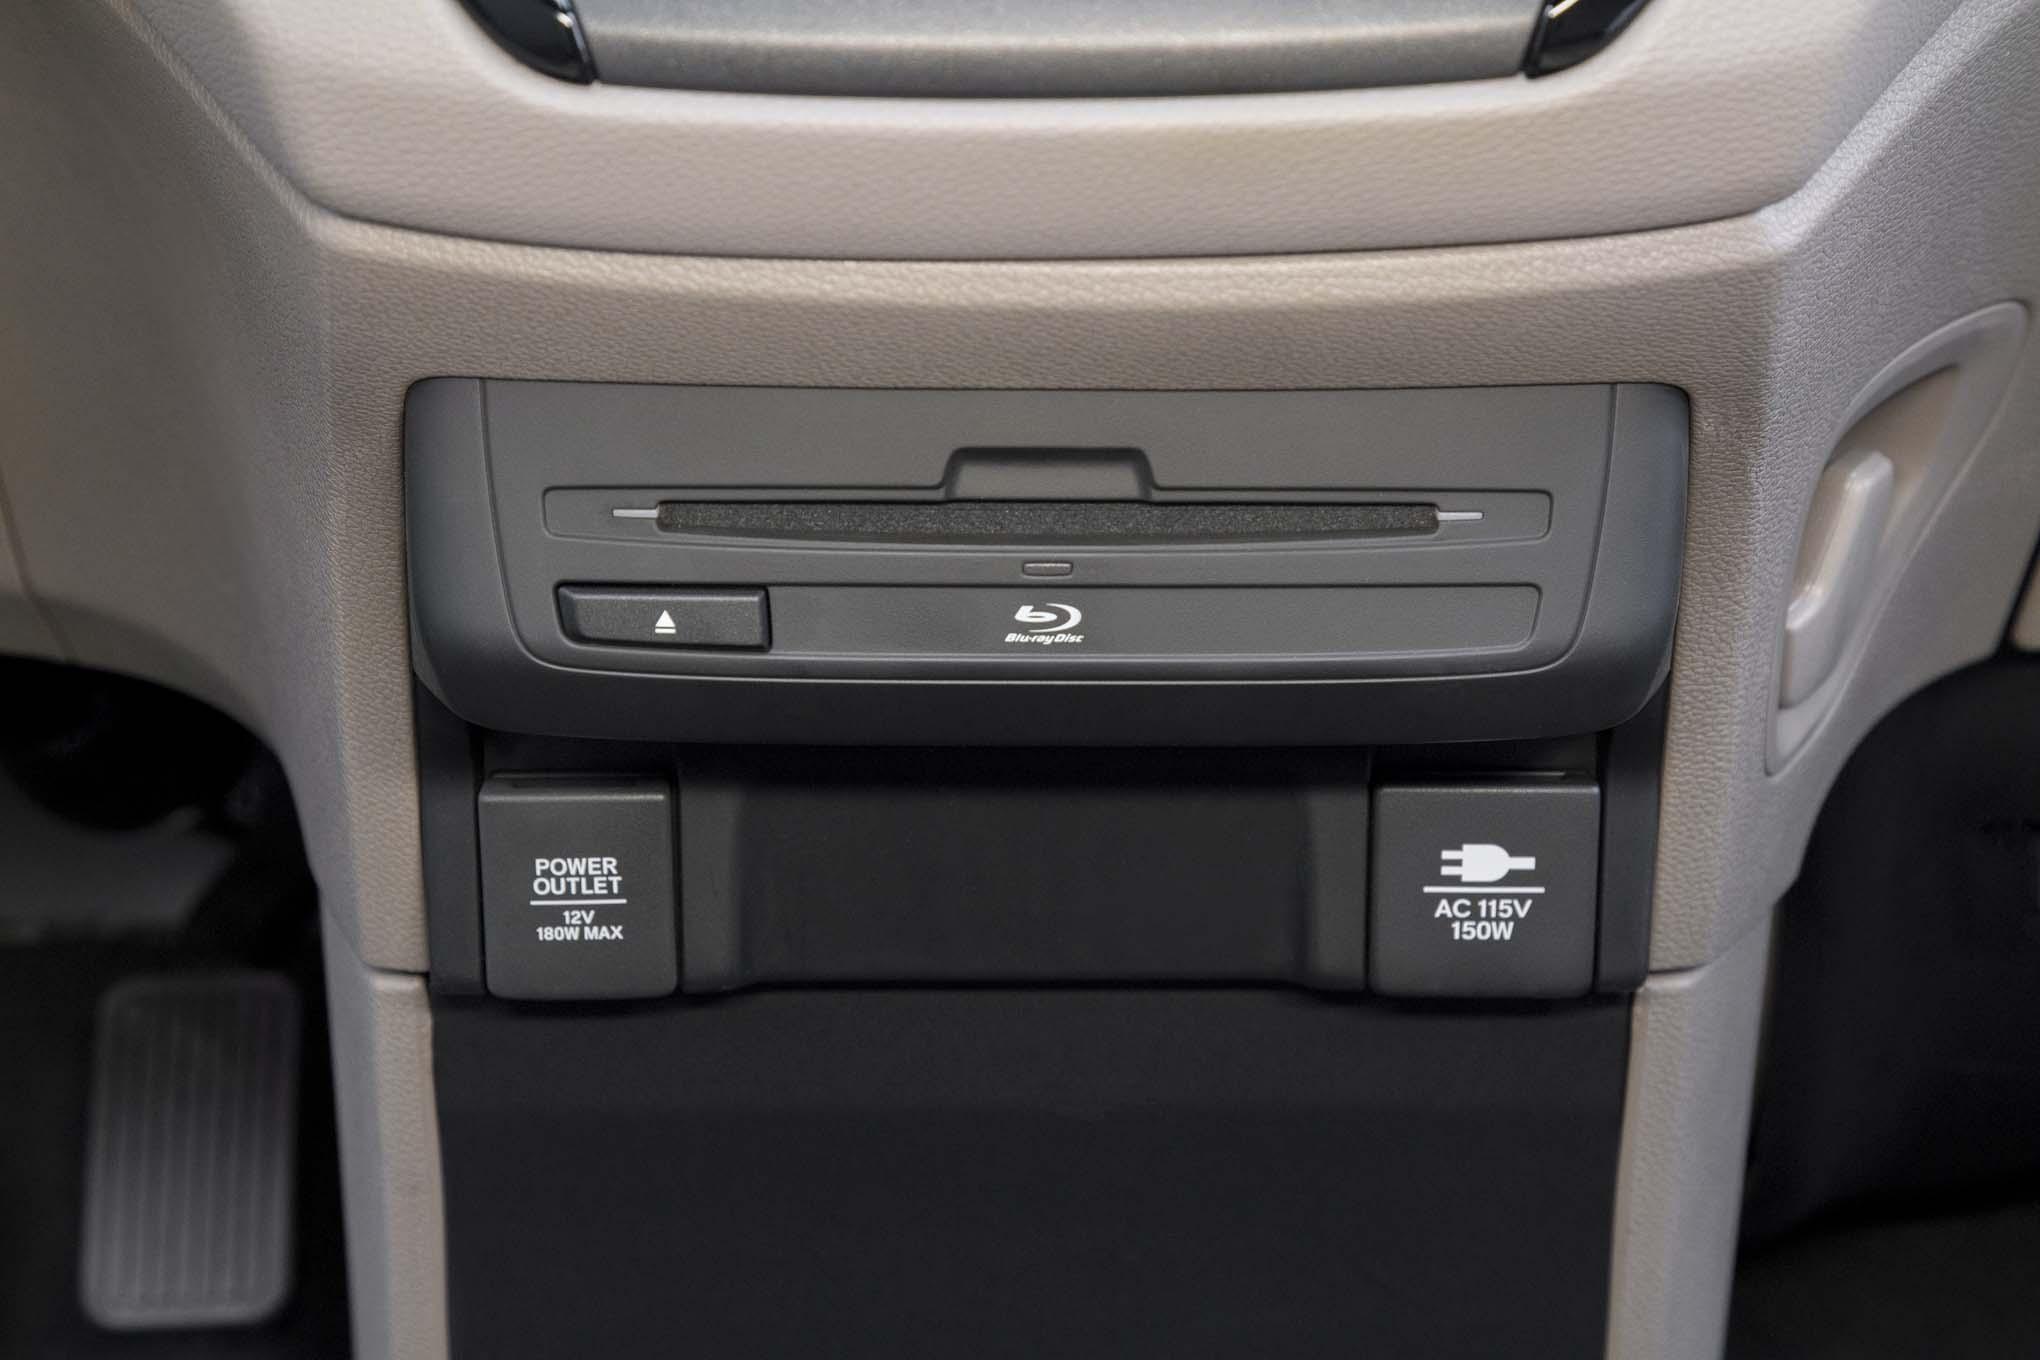 2018 Honda Odyssey Rear Power Outlets